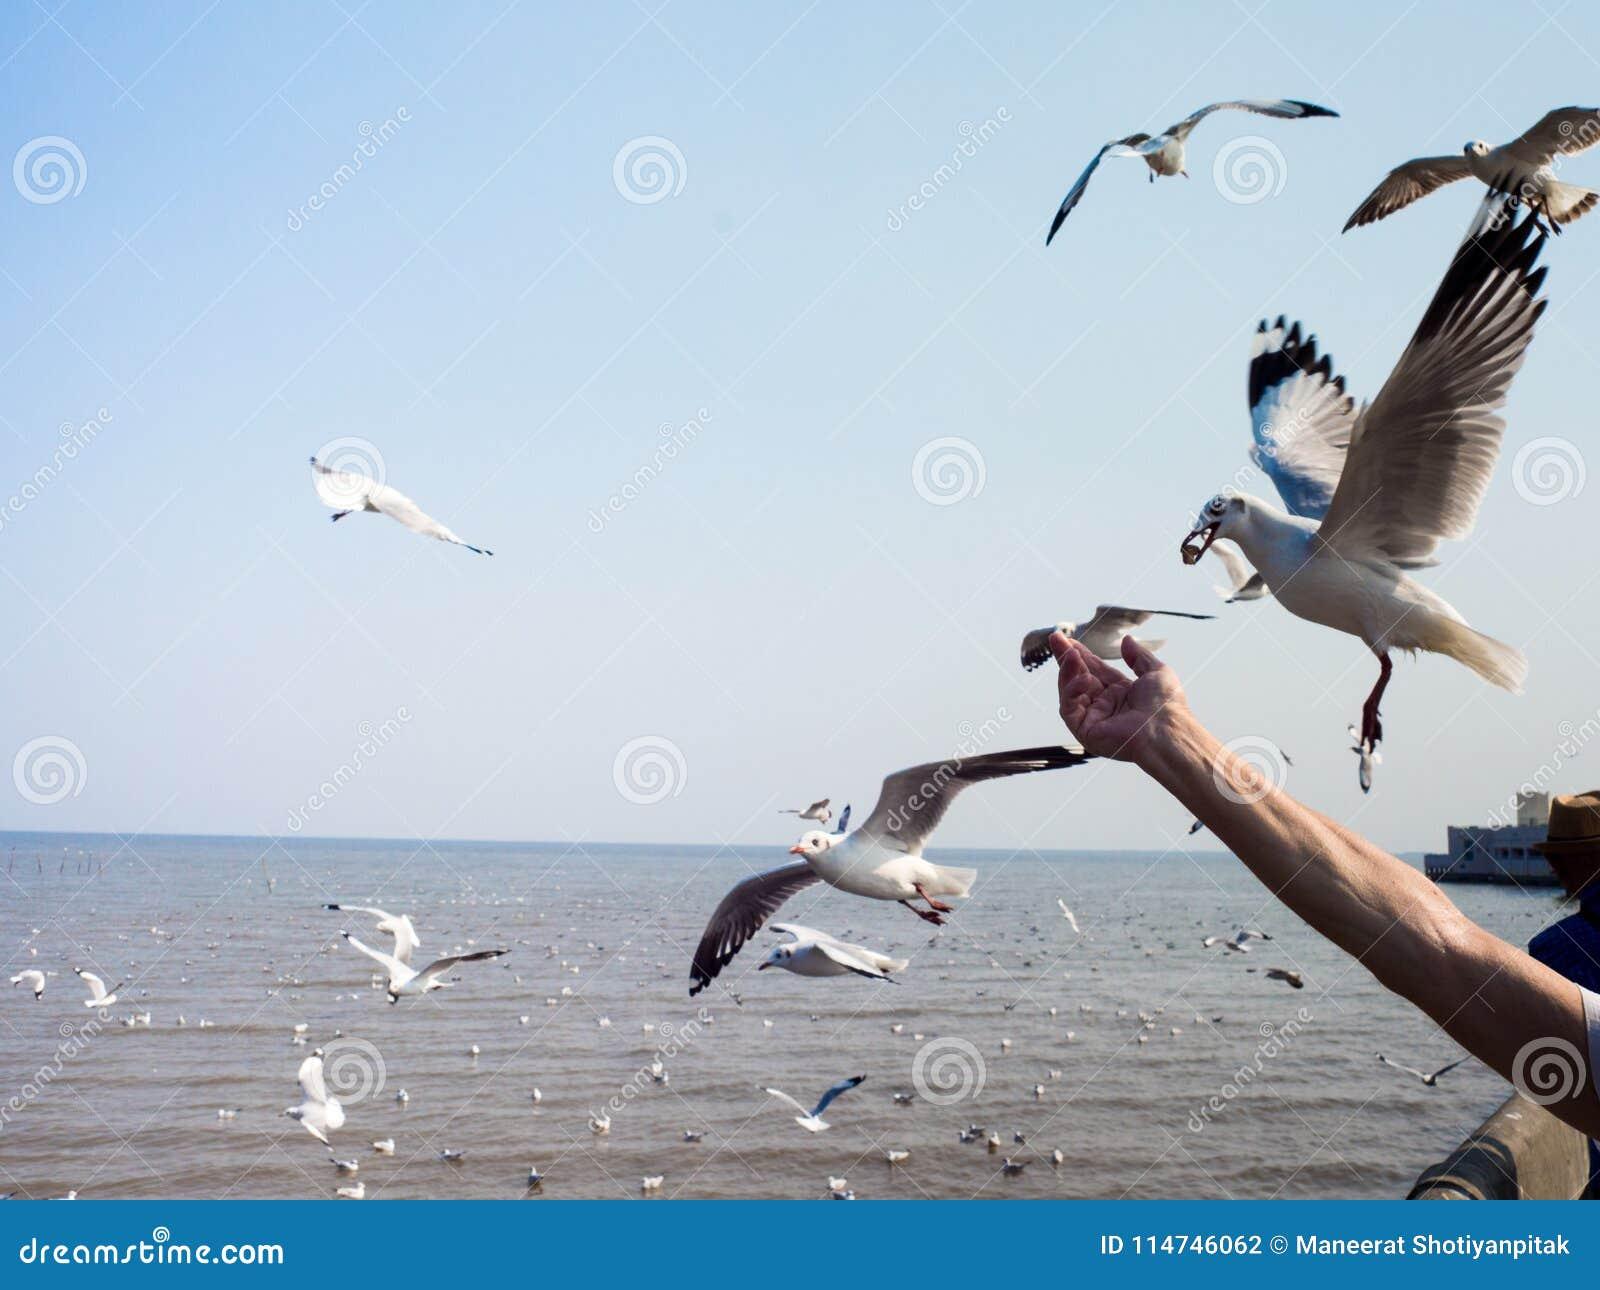 The tourist feeding seagulls at Bangpoo Beach, SAMUTPRAKARN, THAILAND Feb 2018